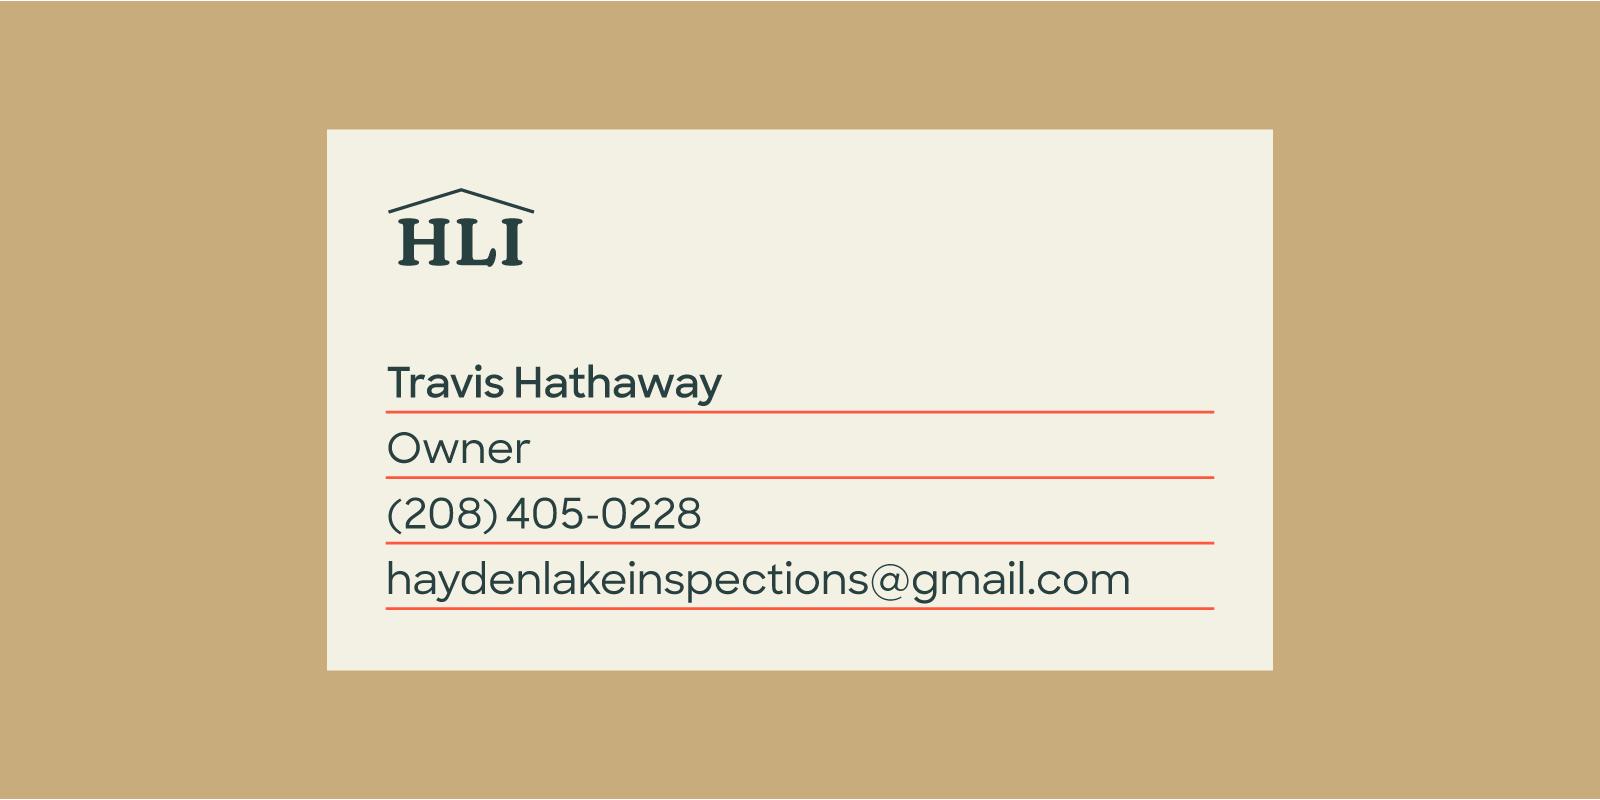 HLI Business Card front